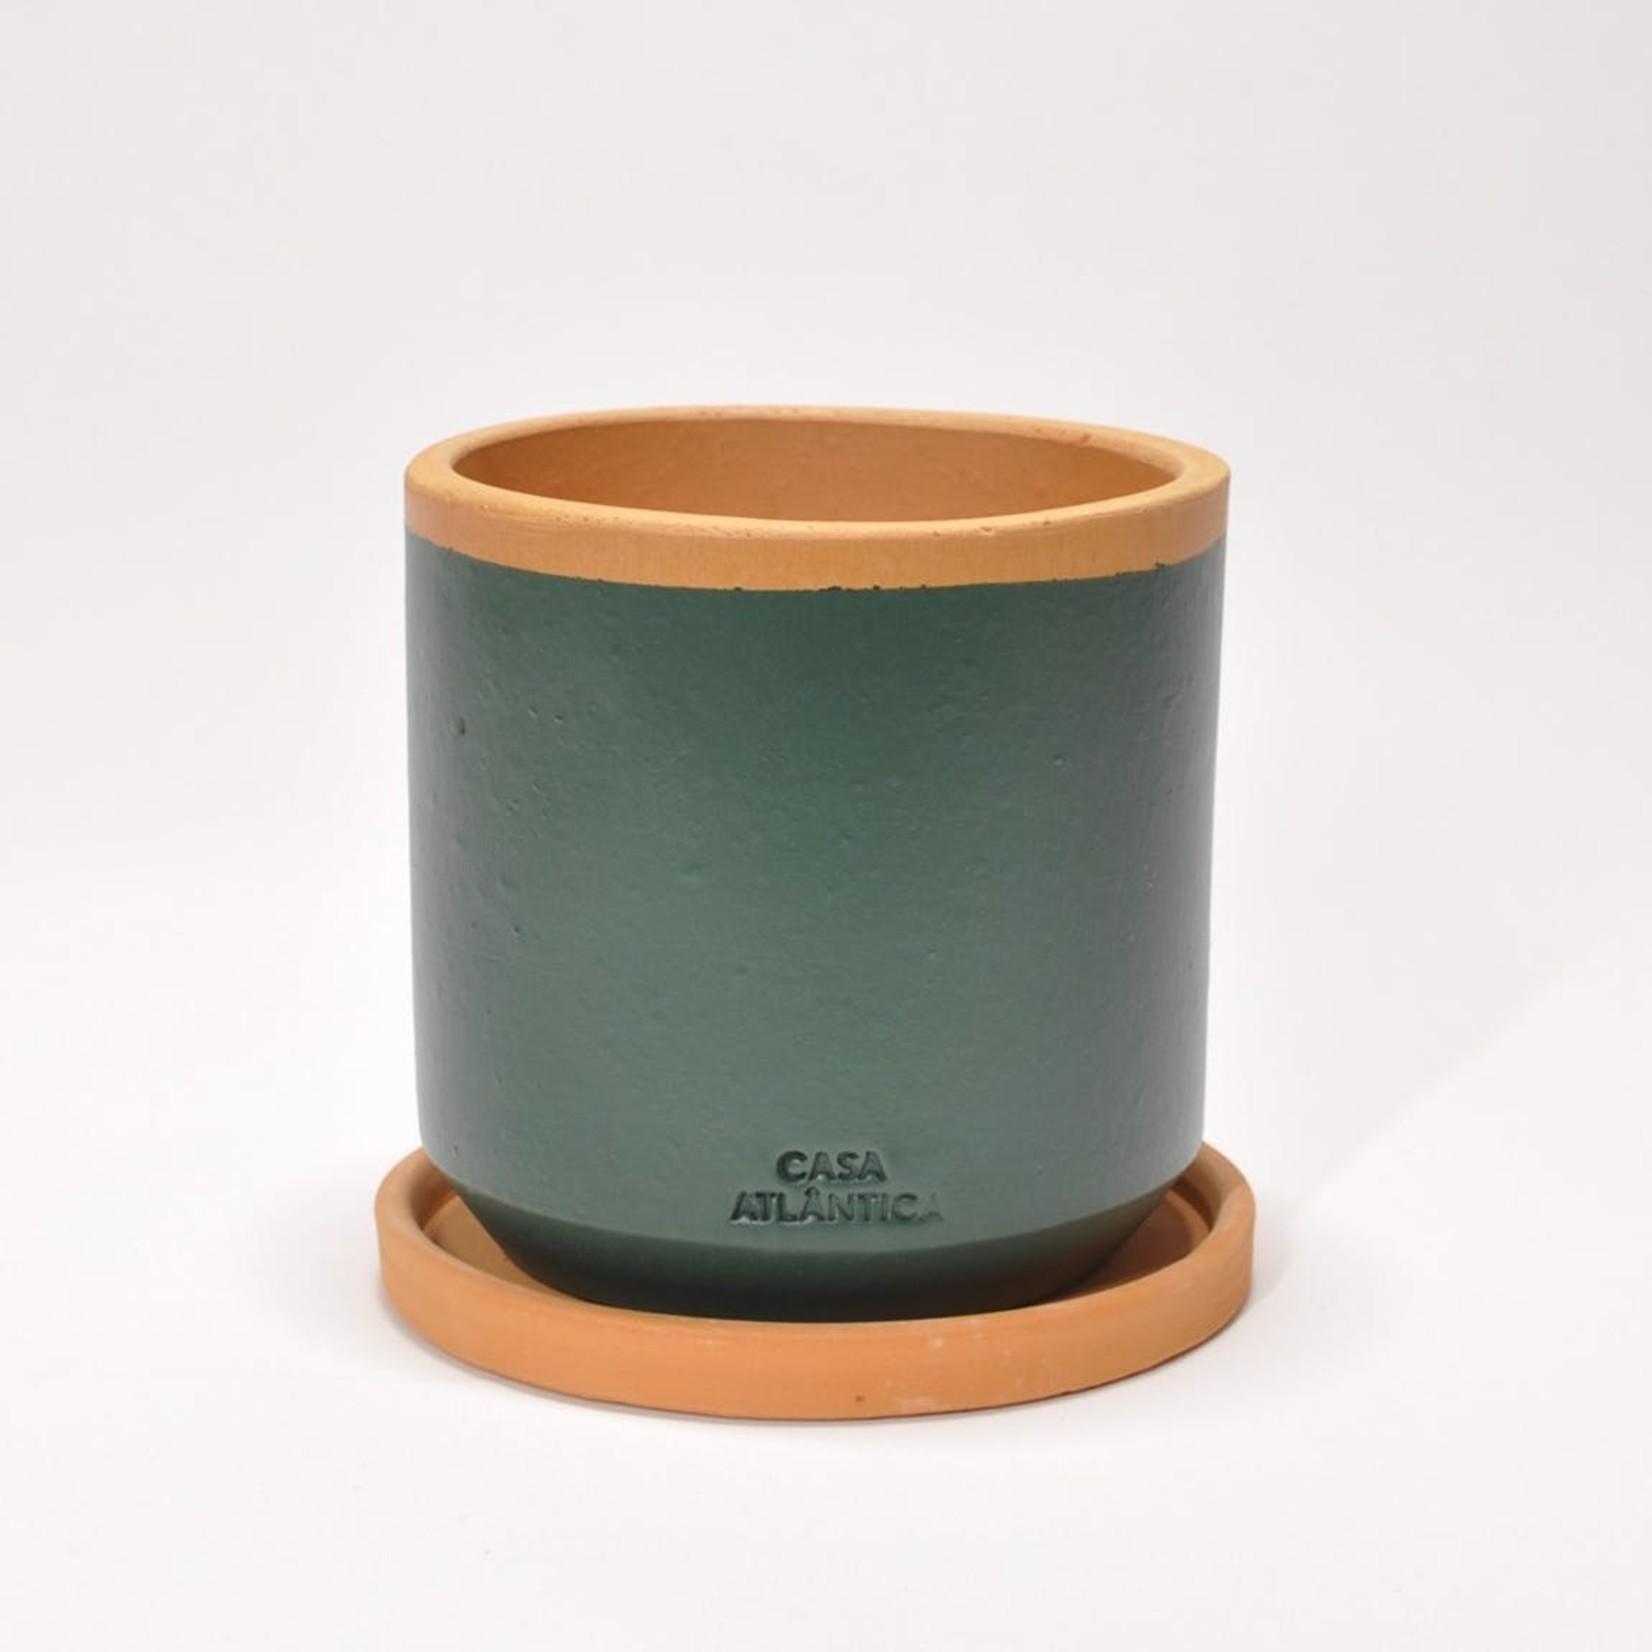 Casa Atlantica Pot Casa Atlantica groen ∅ 19cm